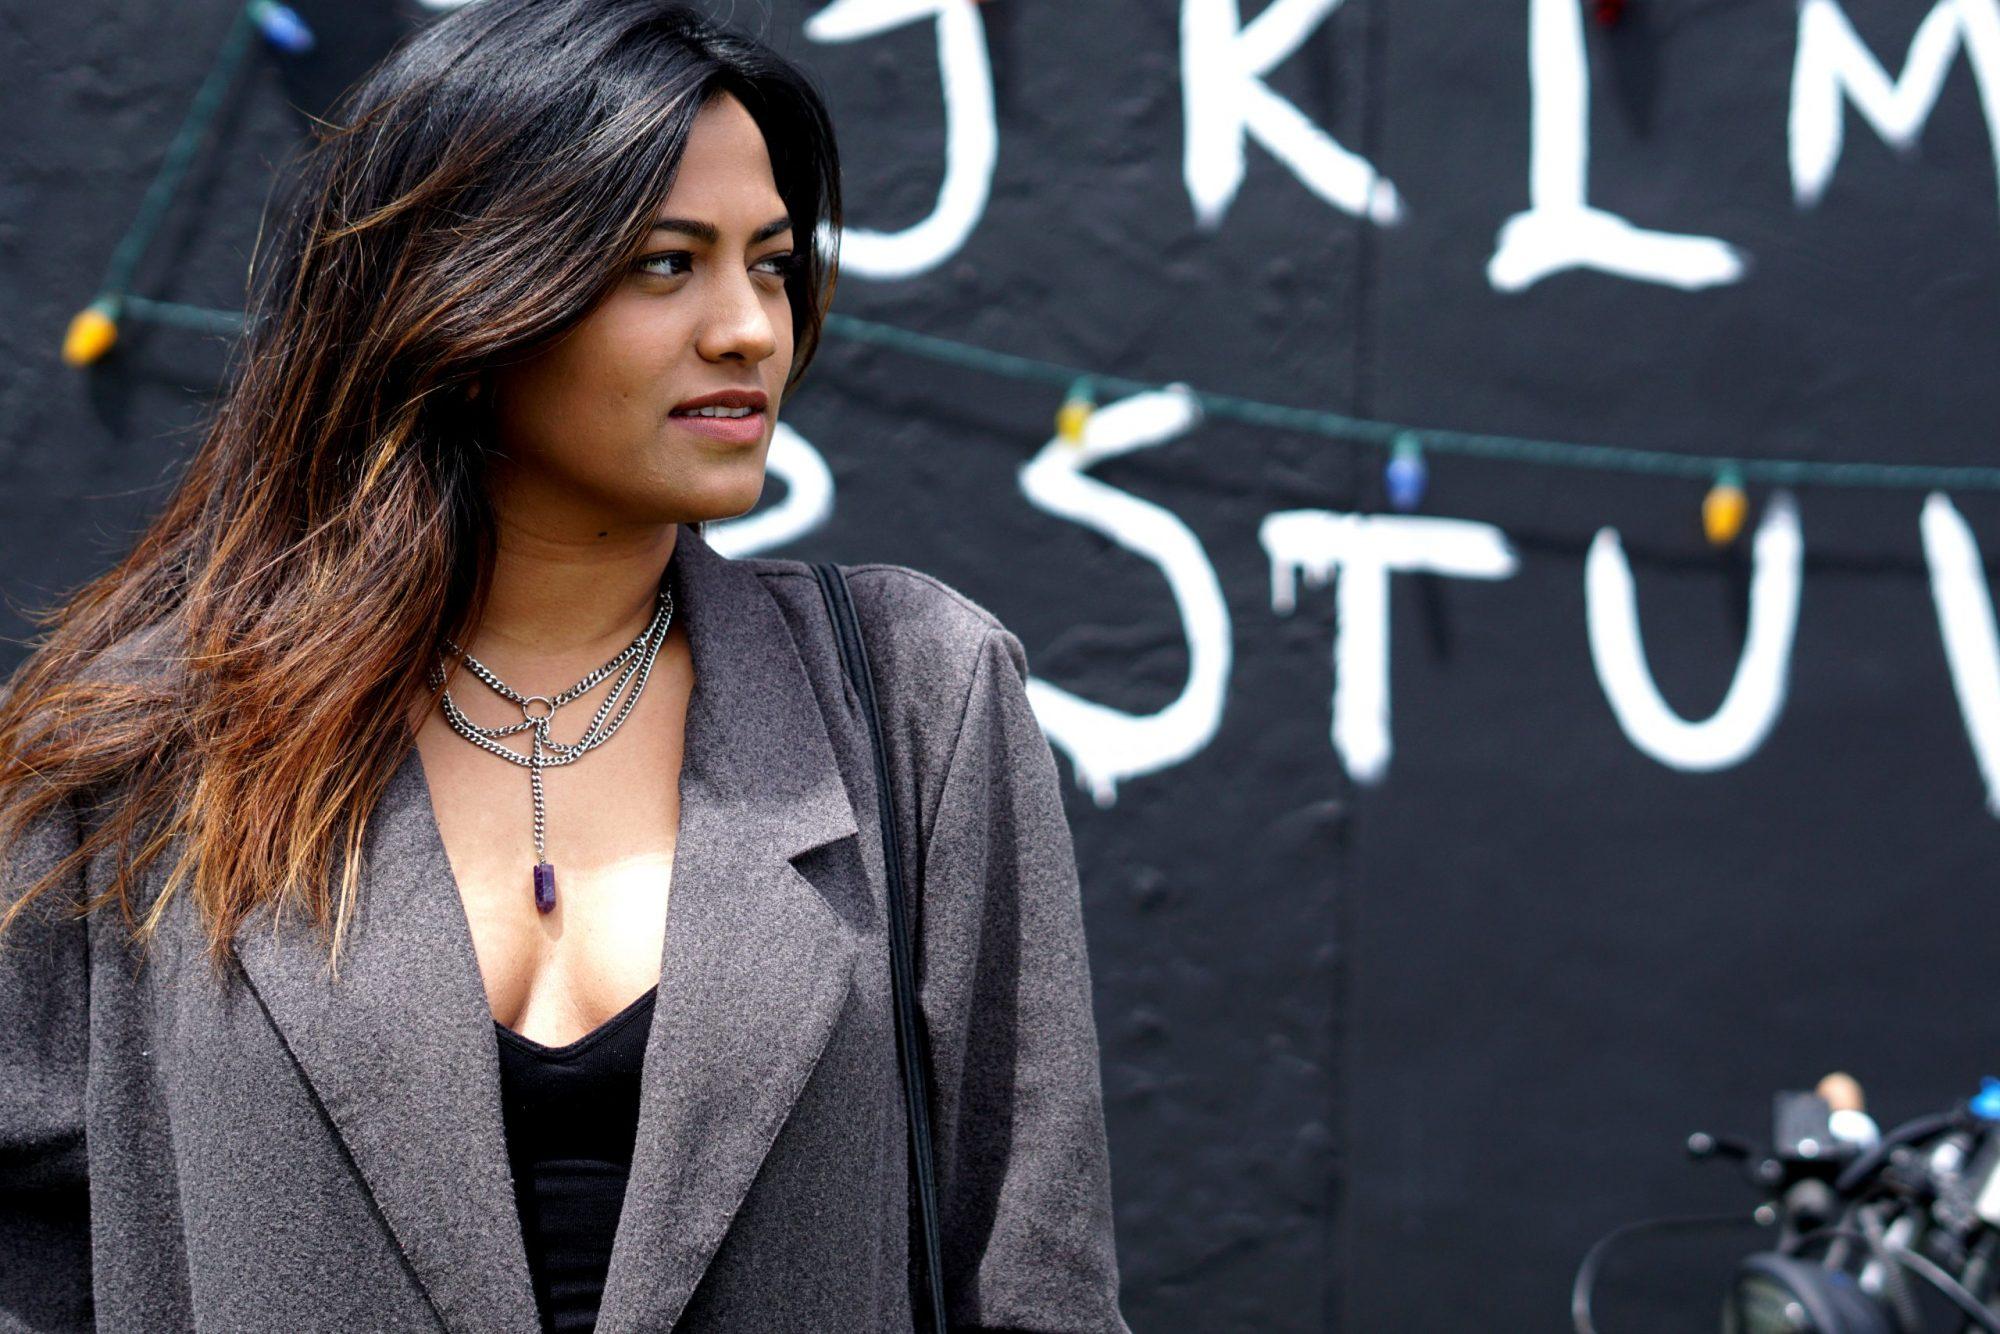 Miami Digital Fashion Tech Blogger Afroza Khan